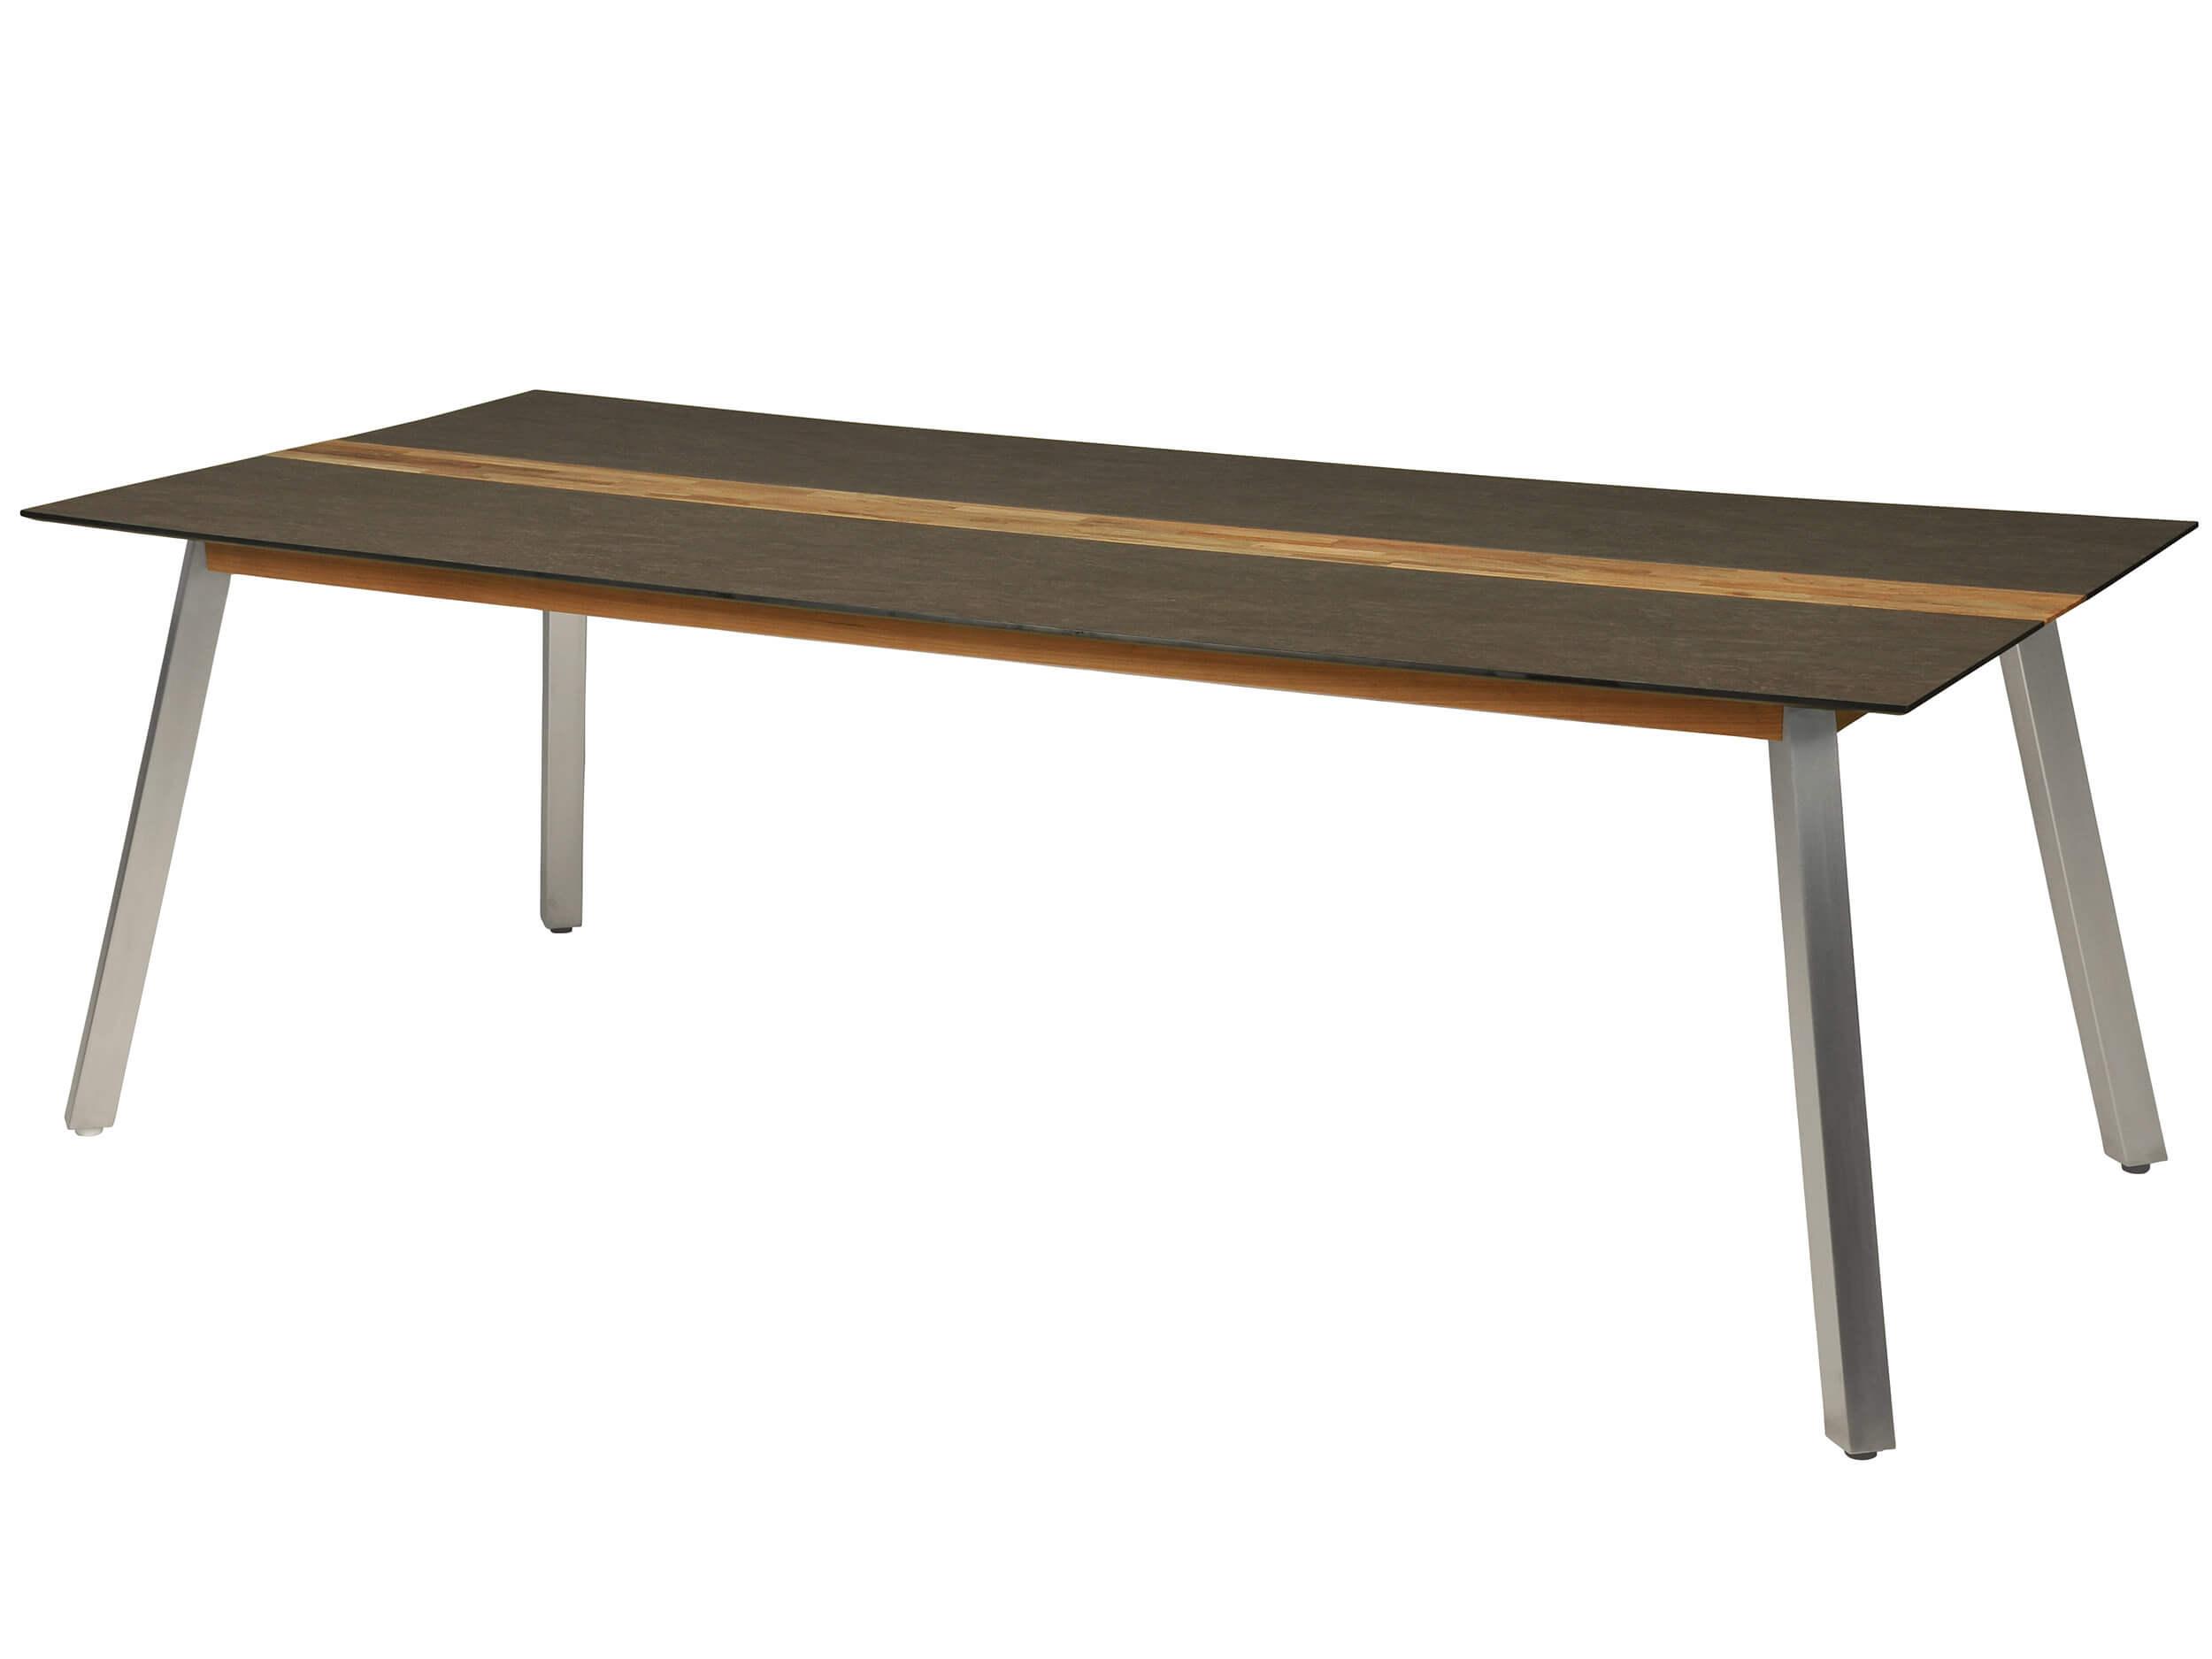 Gartentisch Linax 220x100cm HPL Edelstahl Teak